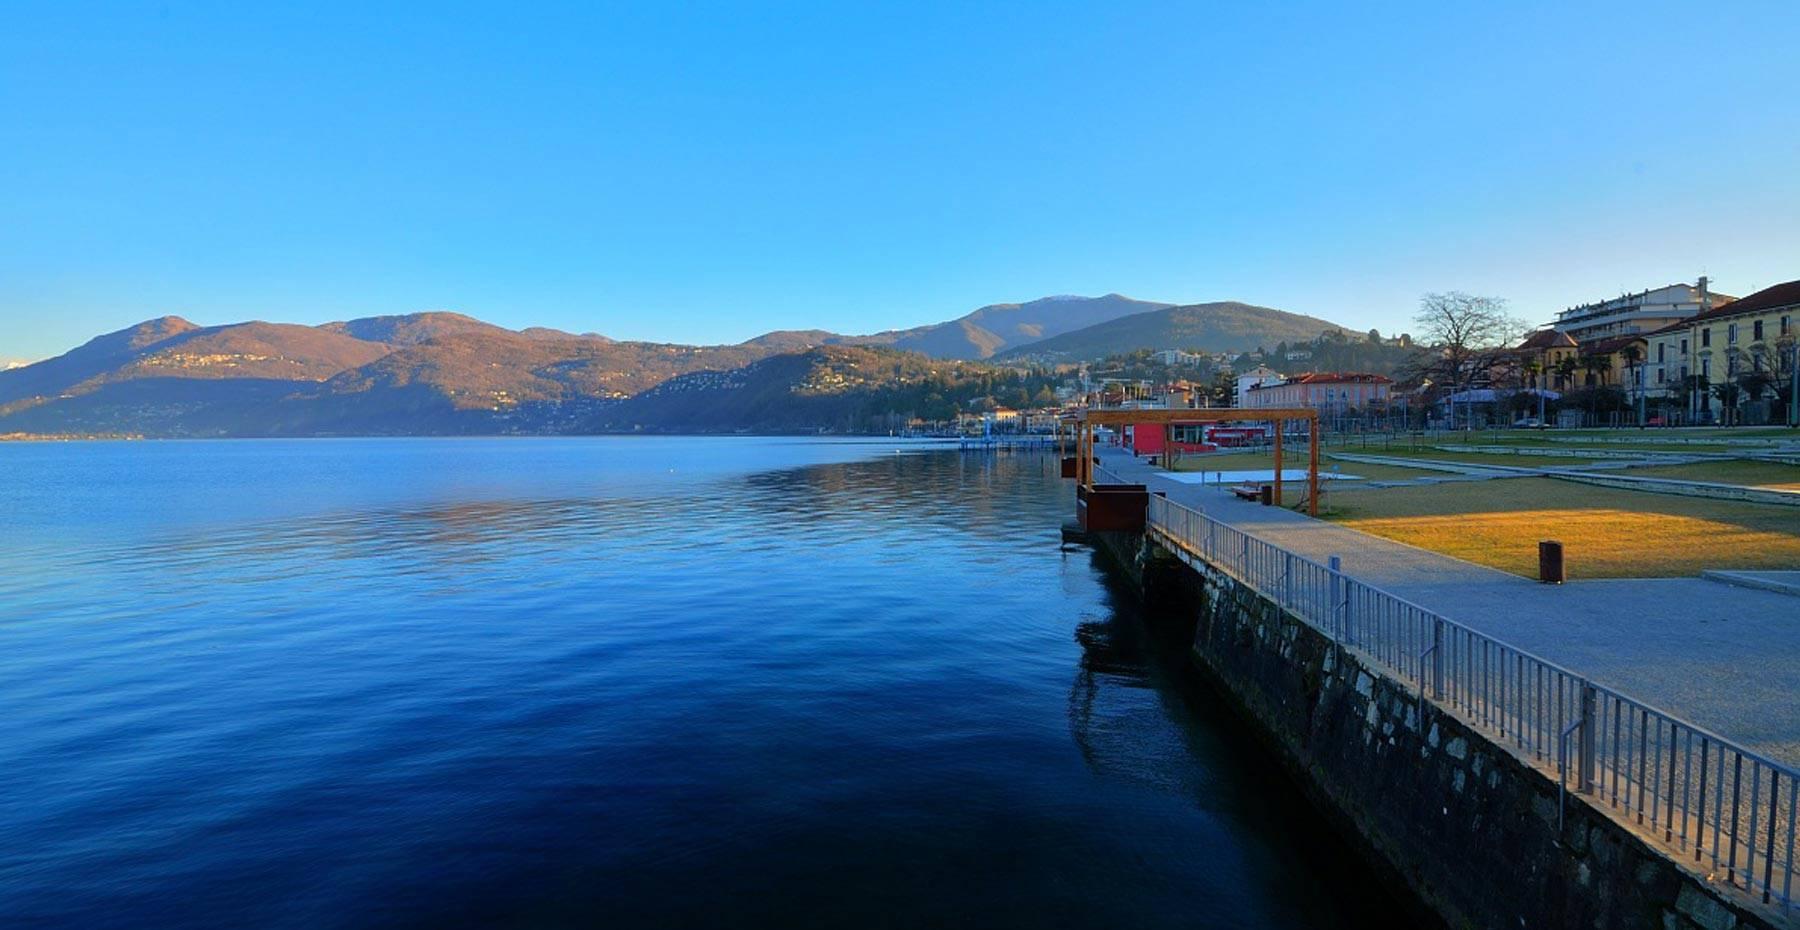 Lago Maggiore Sehenswertes Luino Wanderweg Camin Hotel Luino